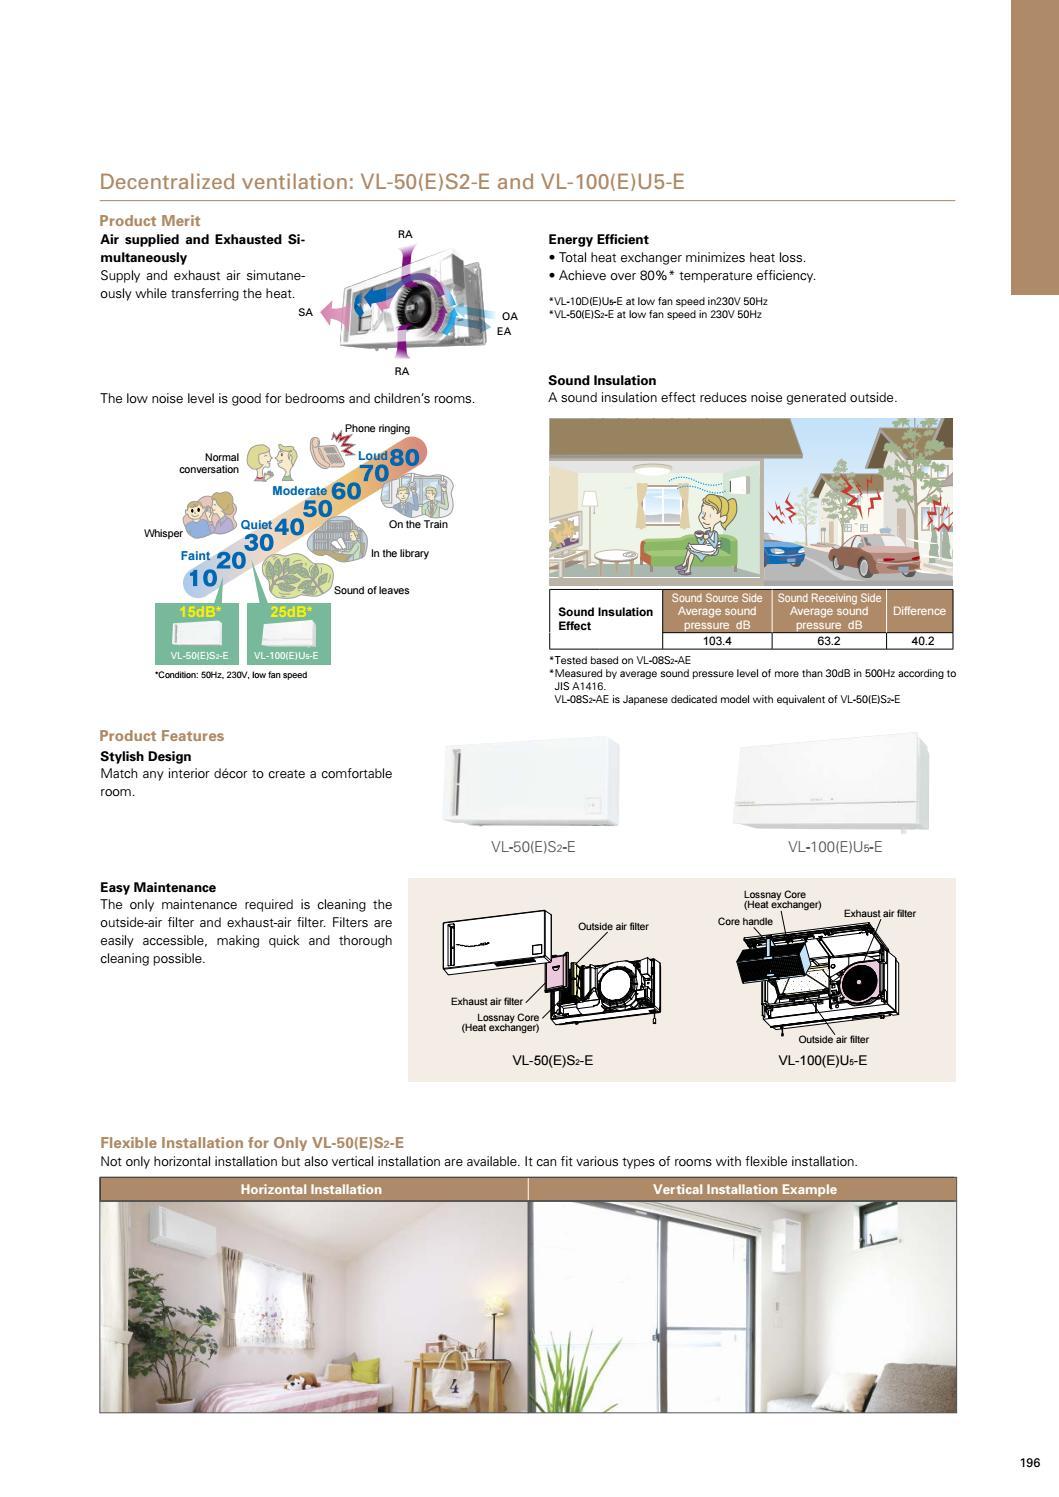 MITSUBISHI ELECTRIC - Generalni katalog 2017, v angleškem jeziku by